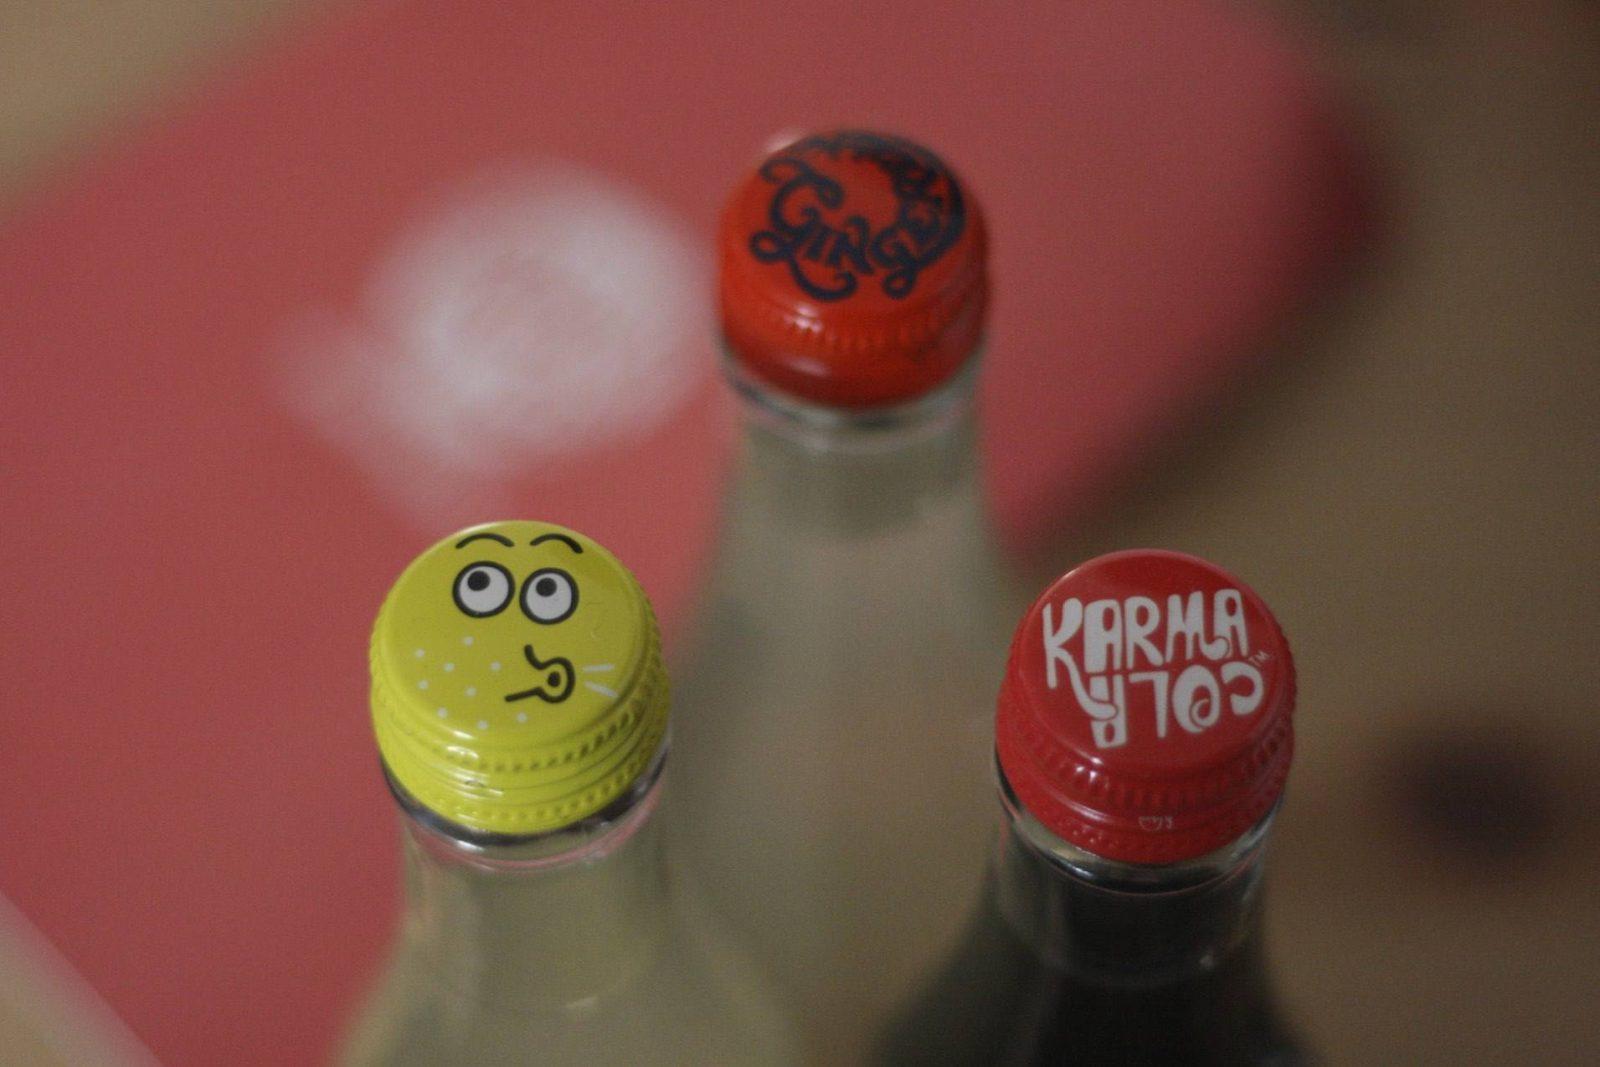 food review: #drinknoevil with karma cola;